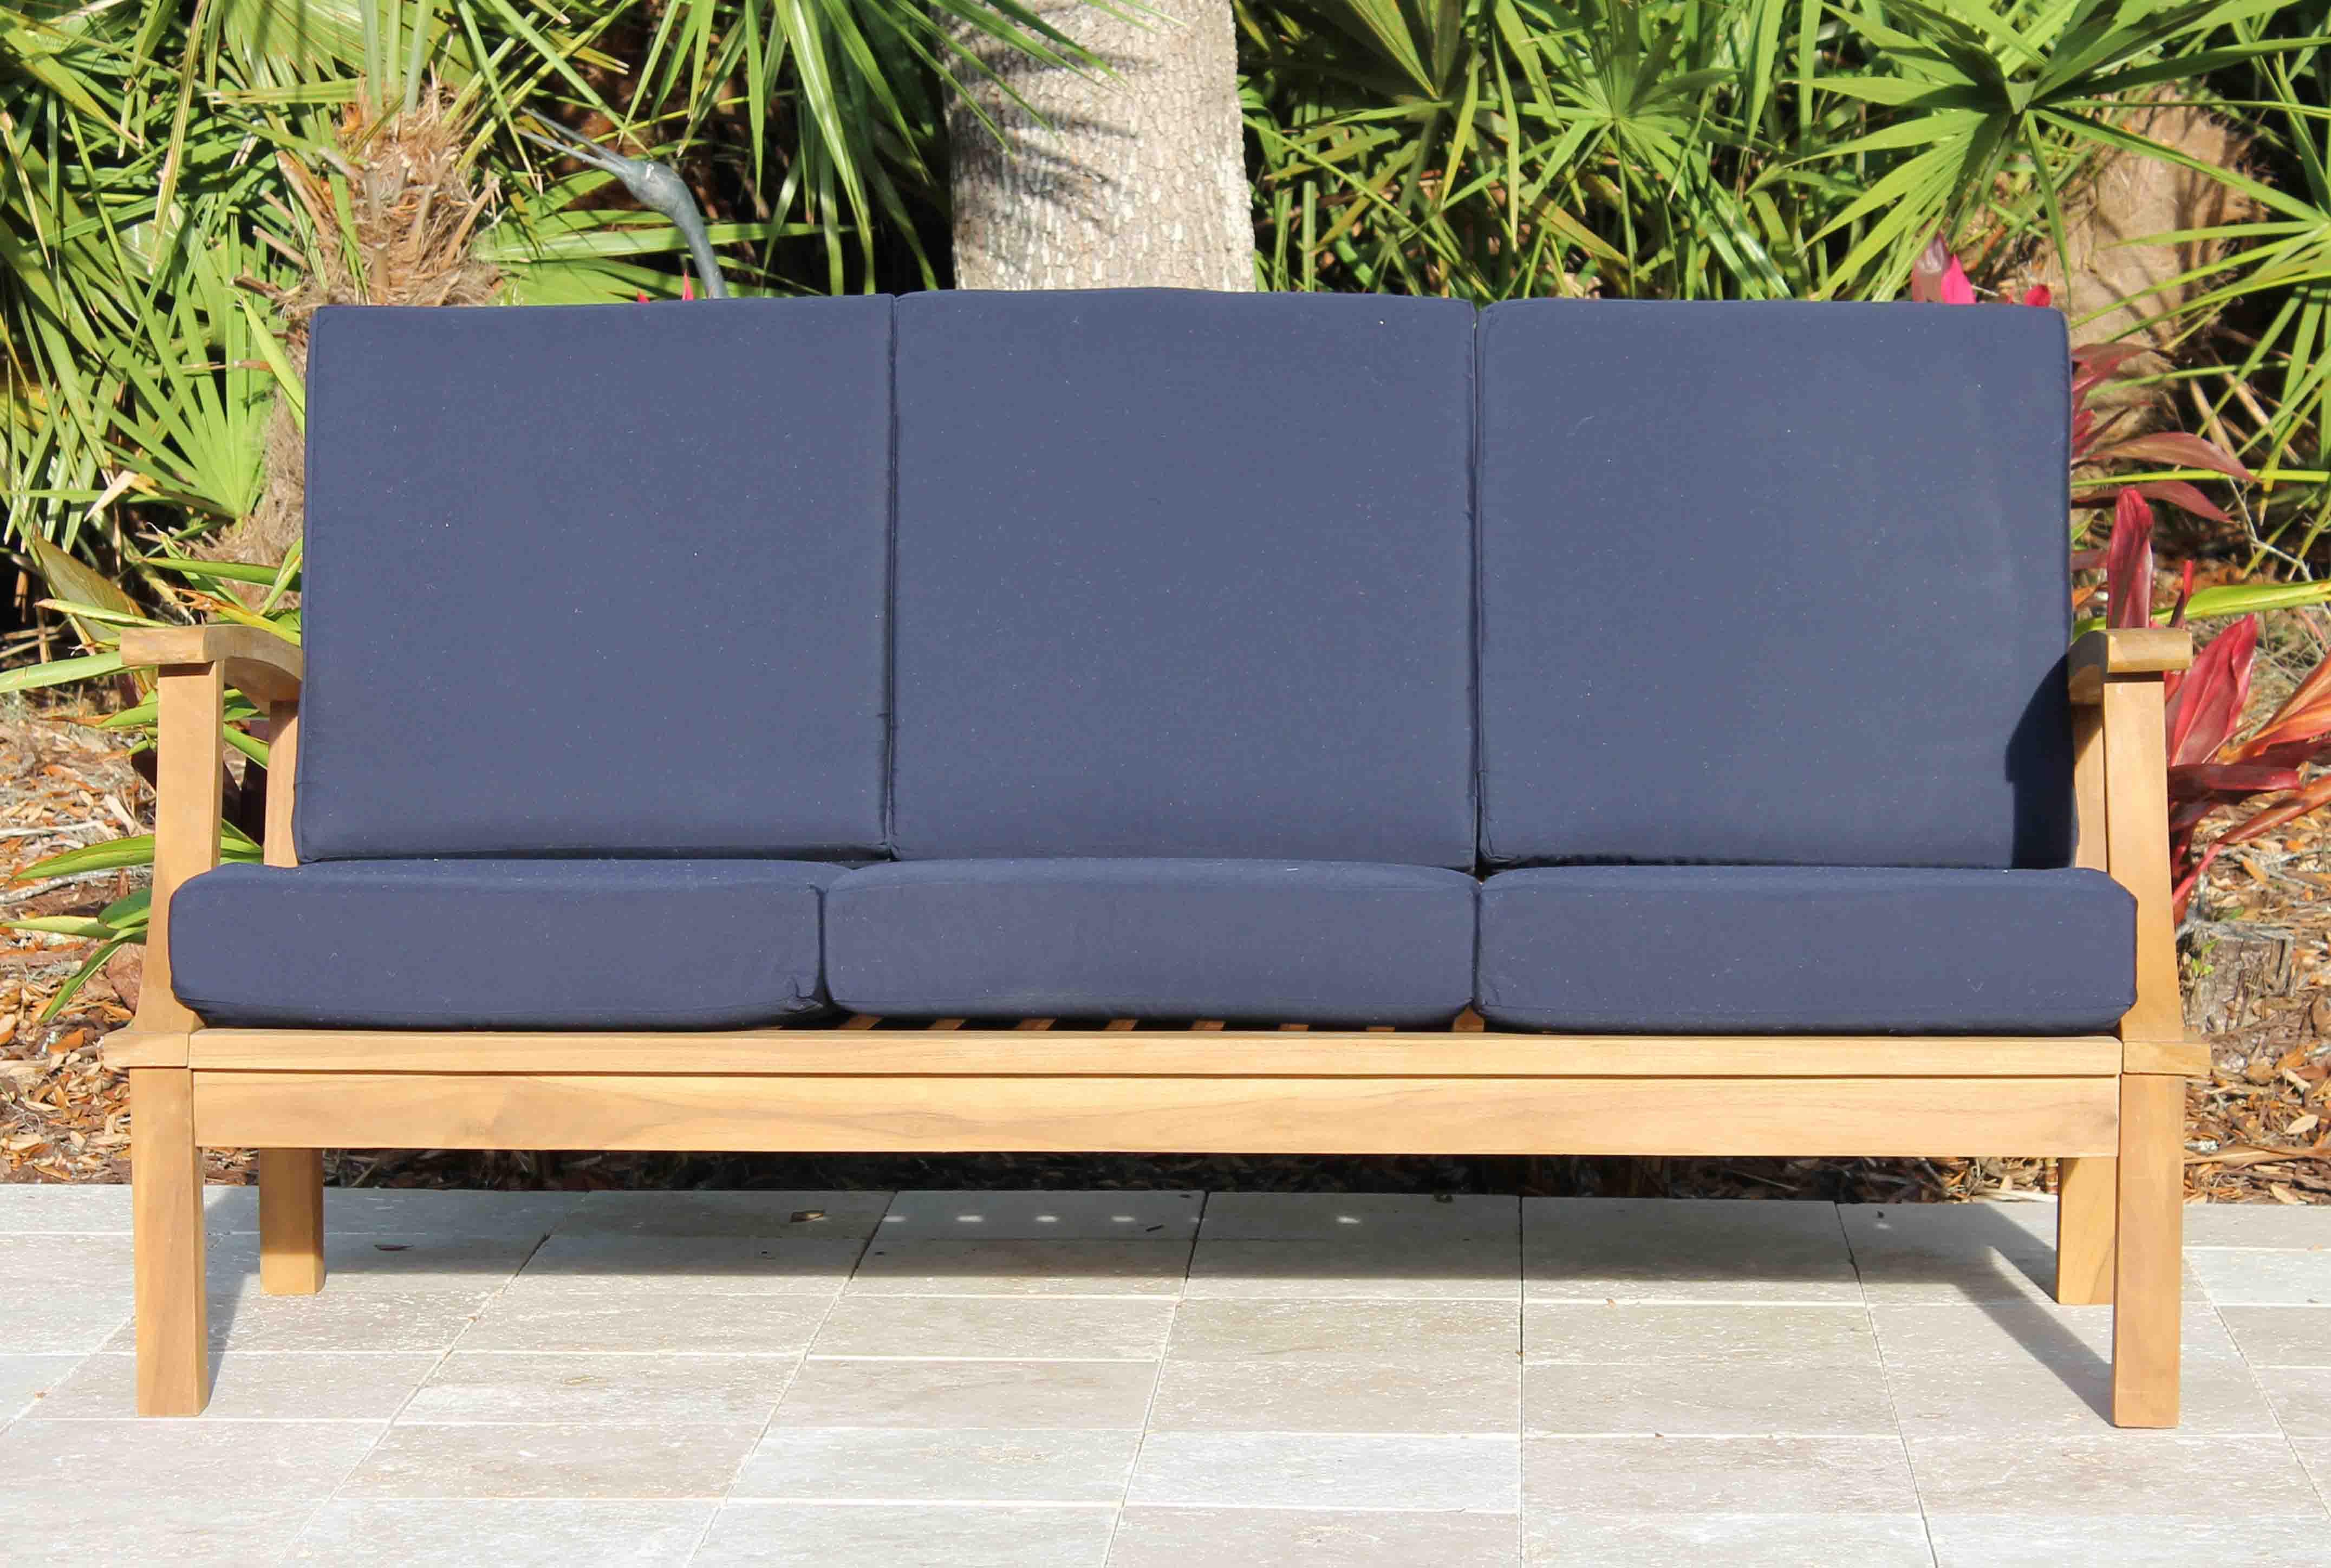 Deep Seat Teak Sofa Including Full Cushions